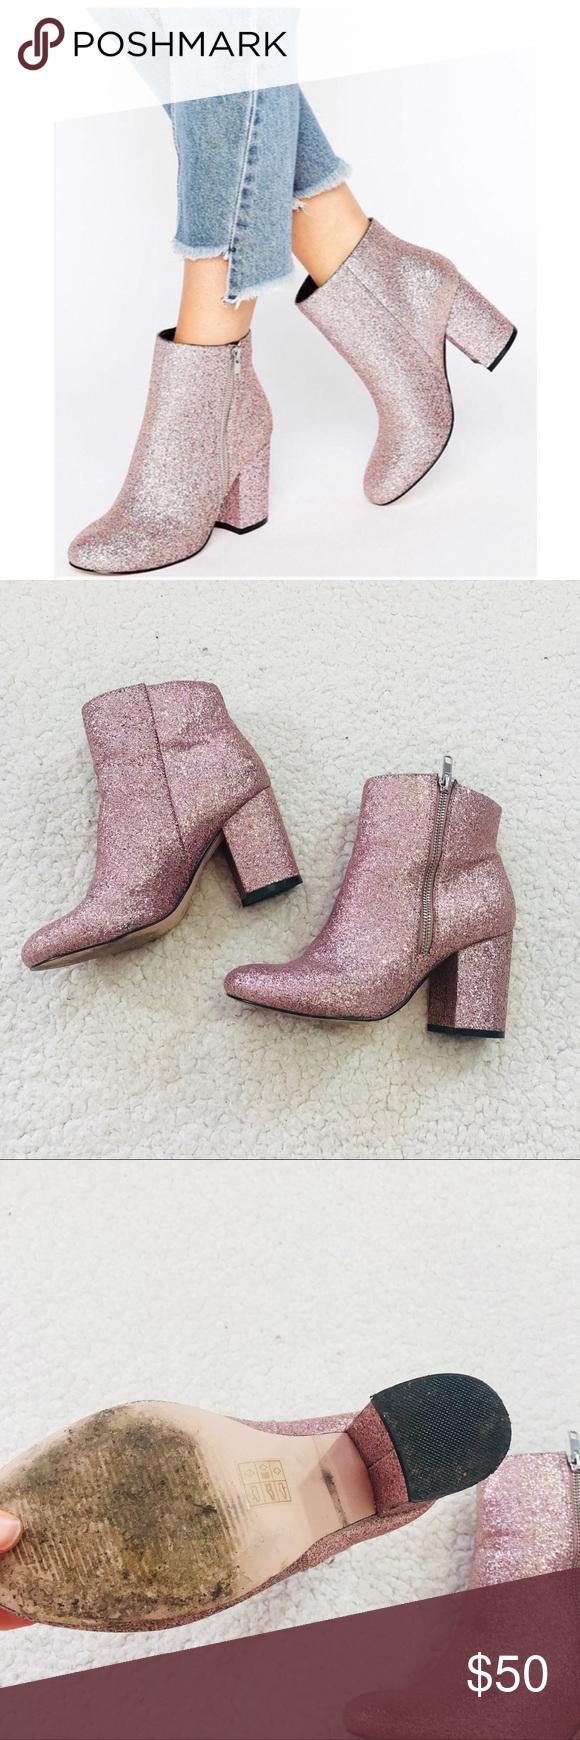 f2a781e52d22 ASOS Regan Glitter Pink Wide Toe Booties Shimmer ASOS Regan Glitter Pink  Wide Toe Booties Shimmer